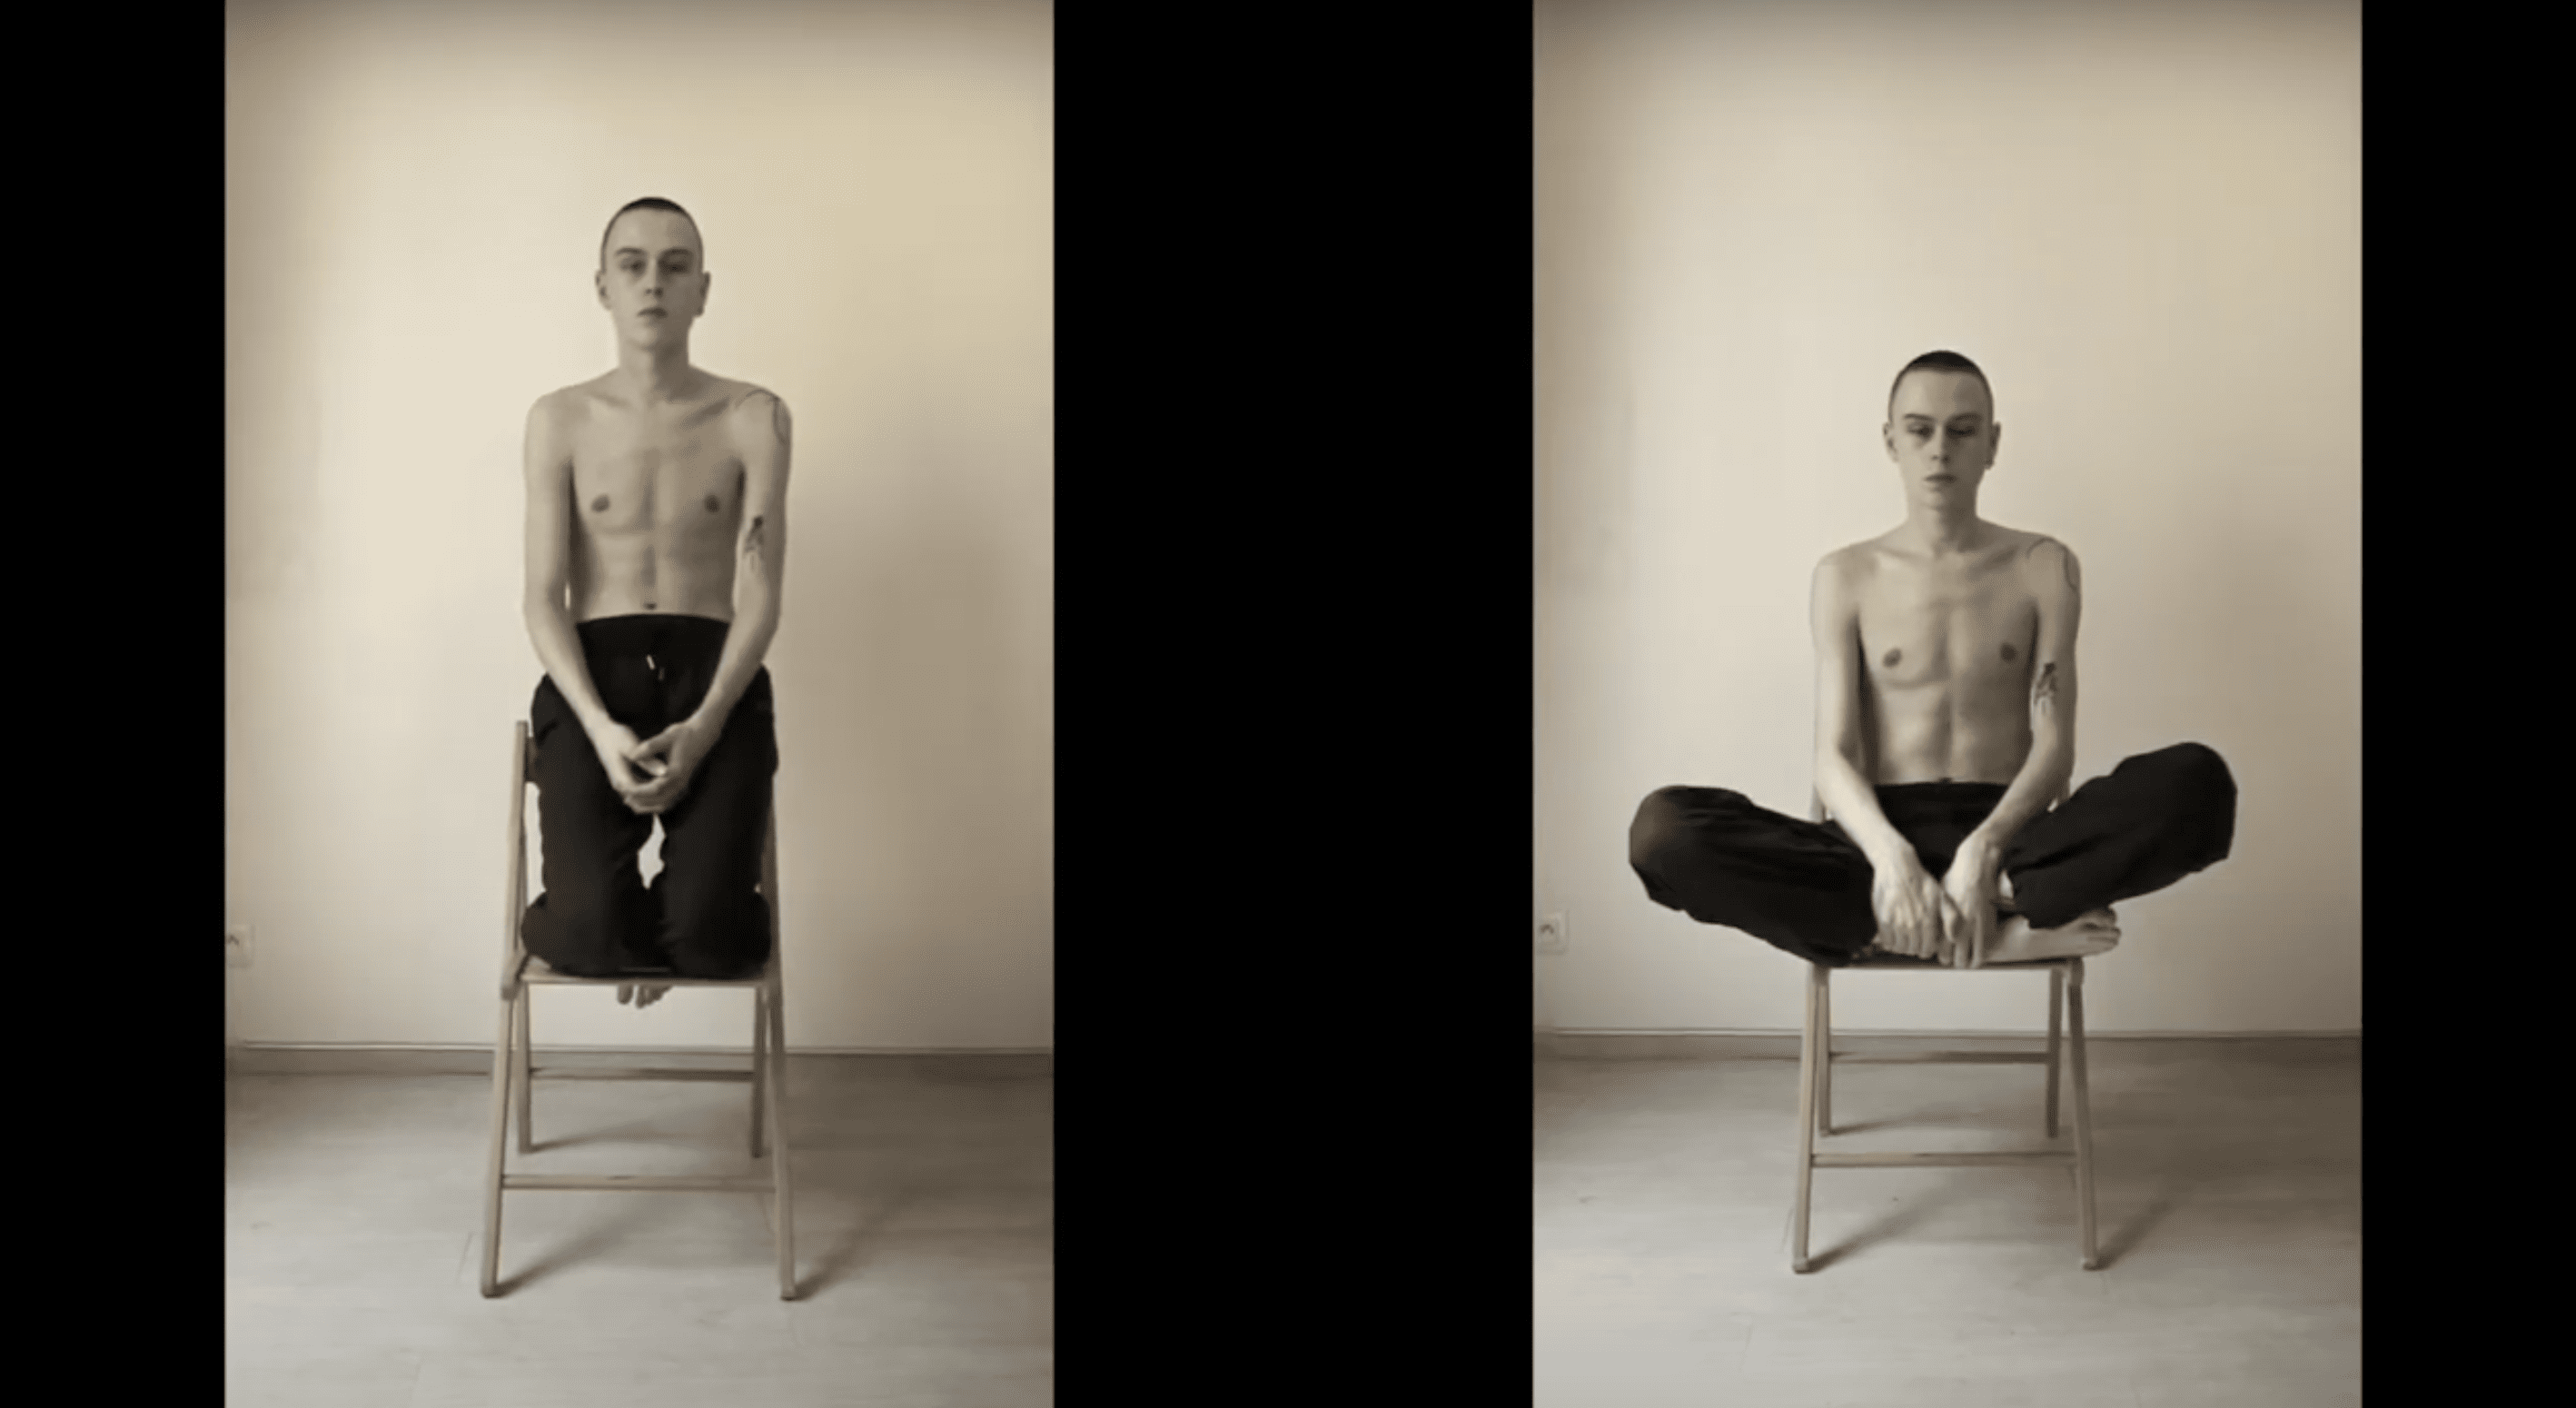 Postures Simultanées